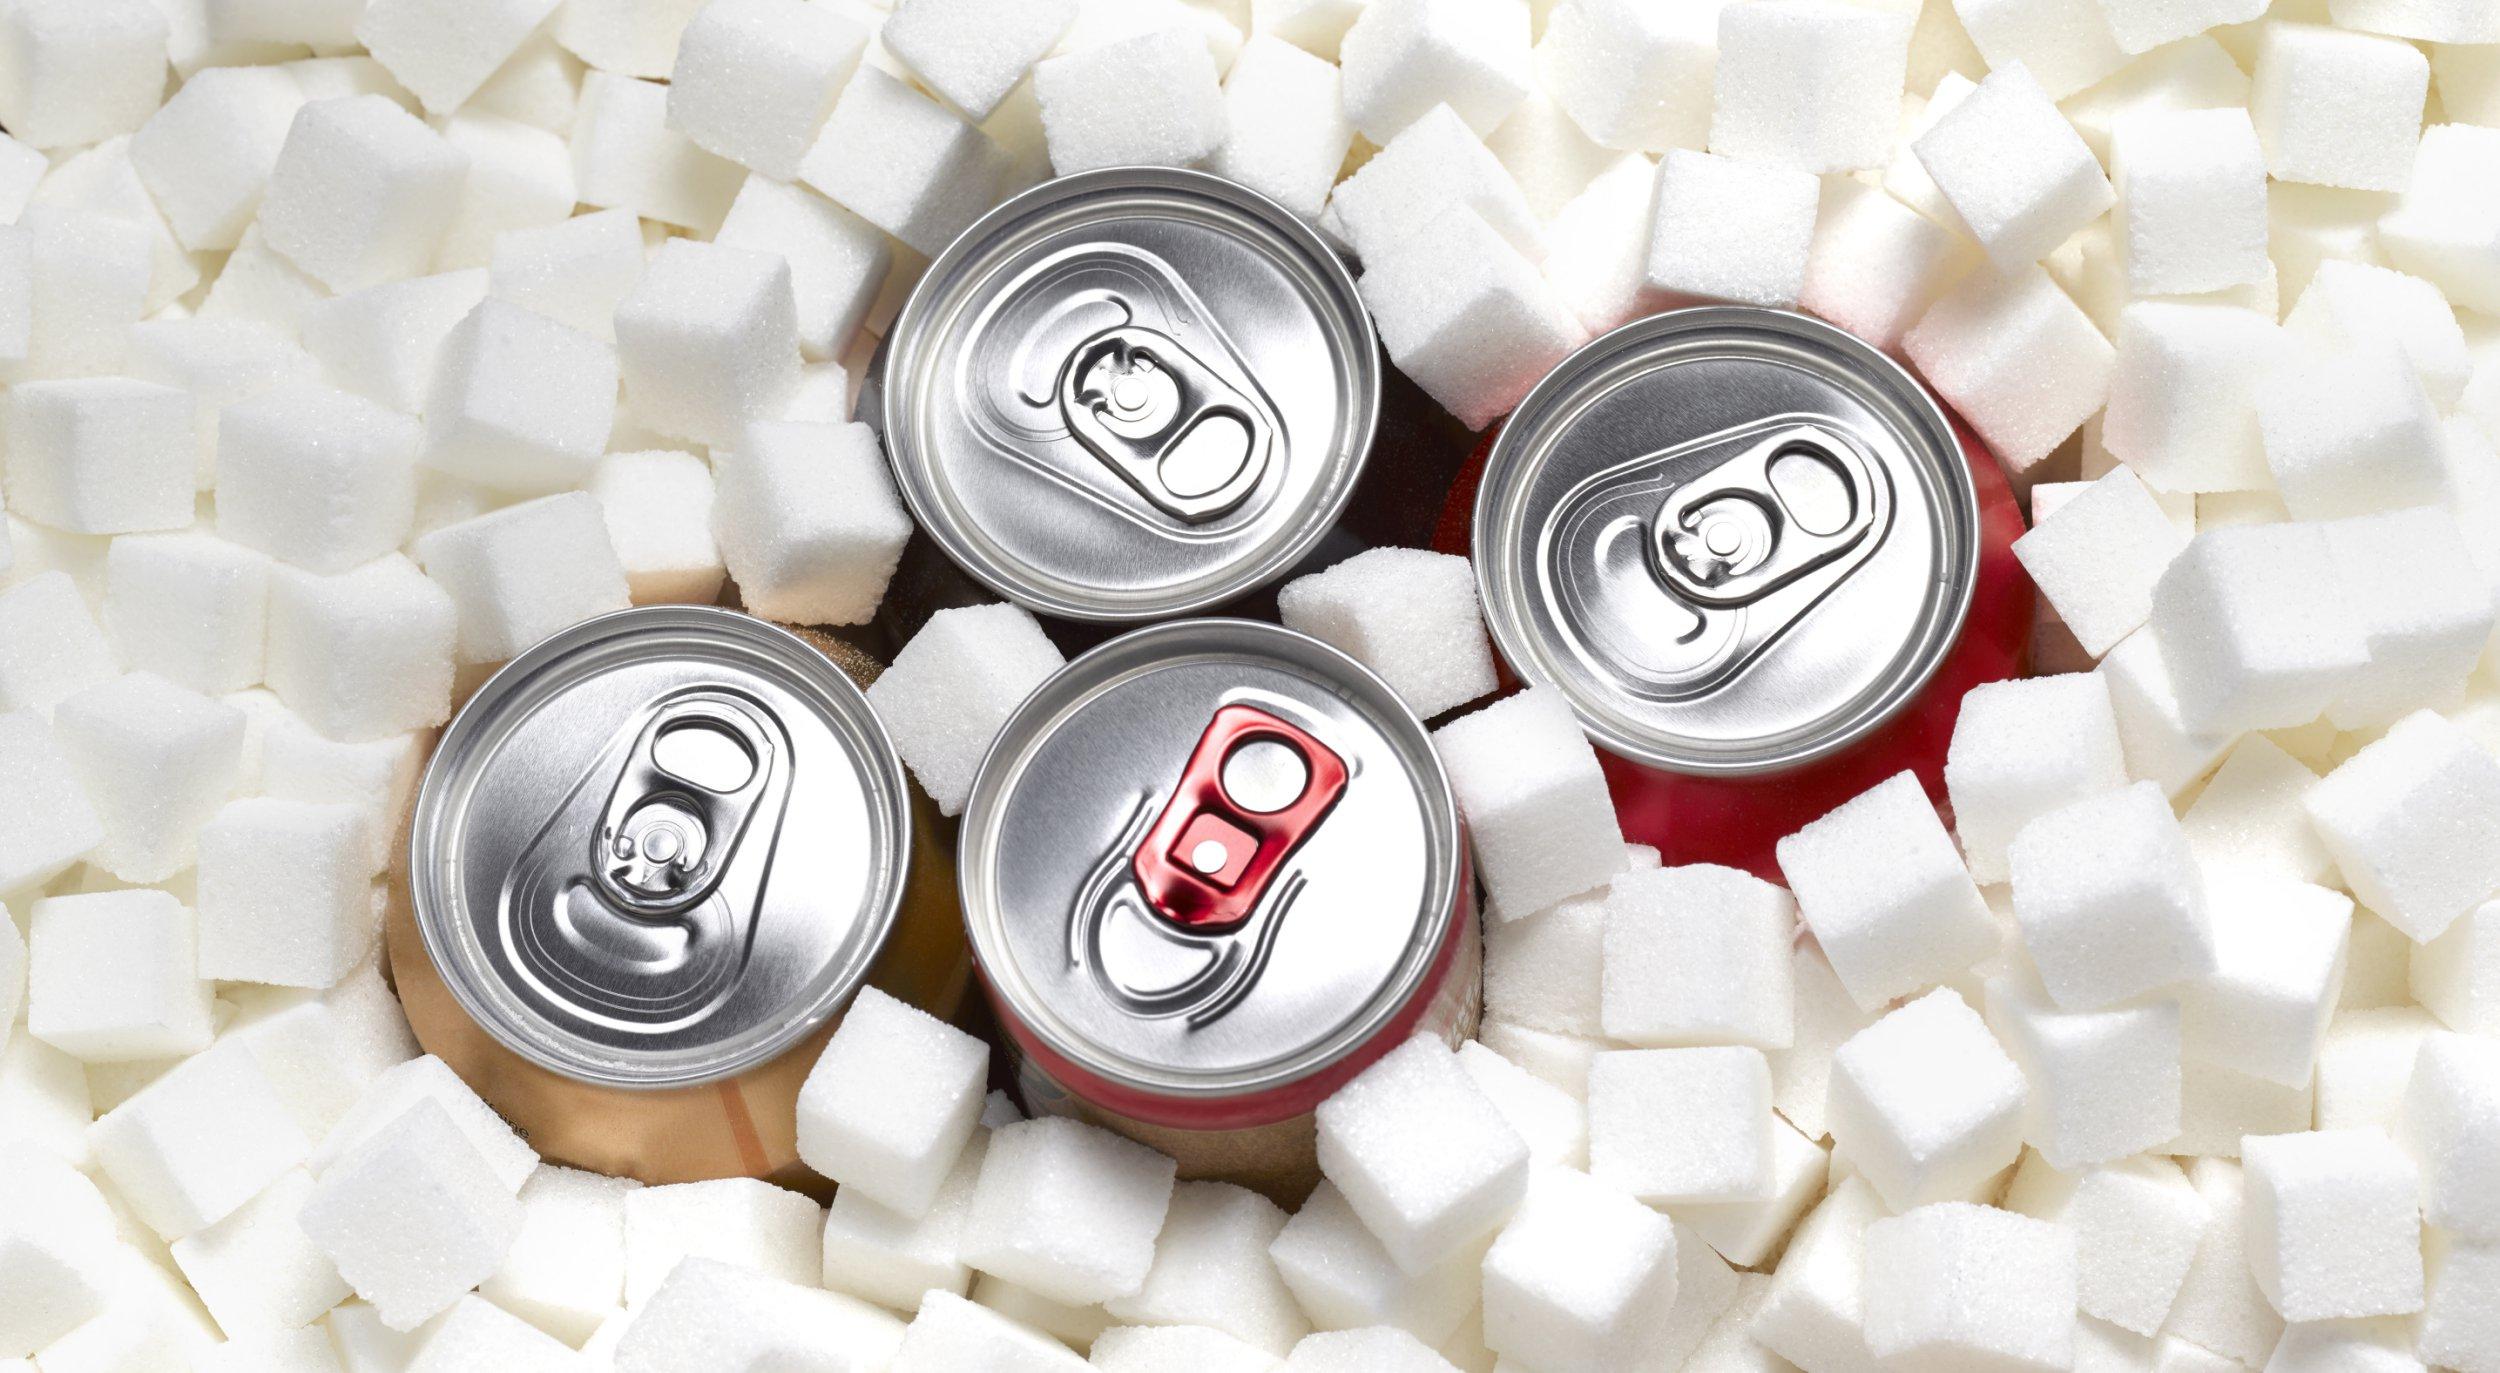 Sugar rush fizzy drinks